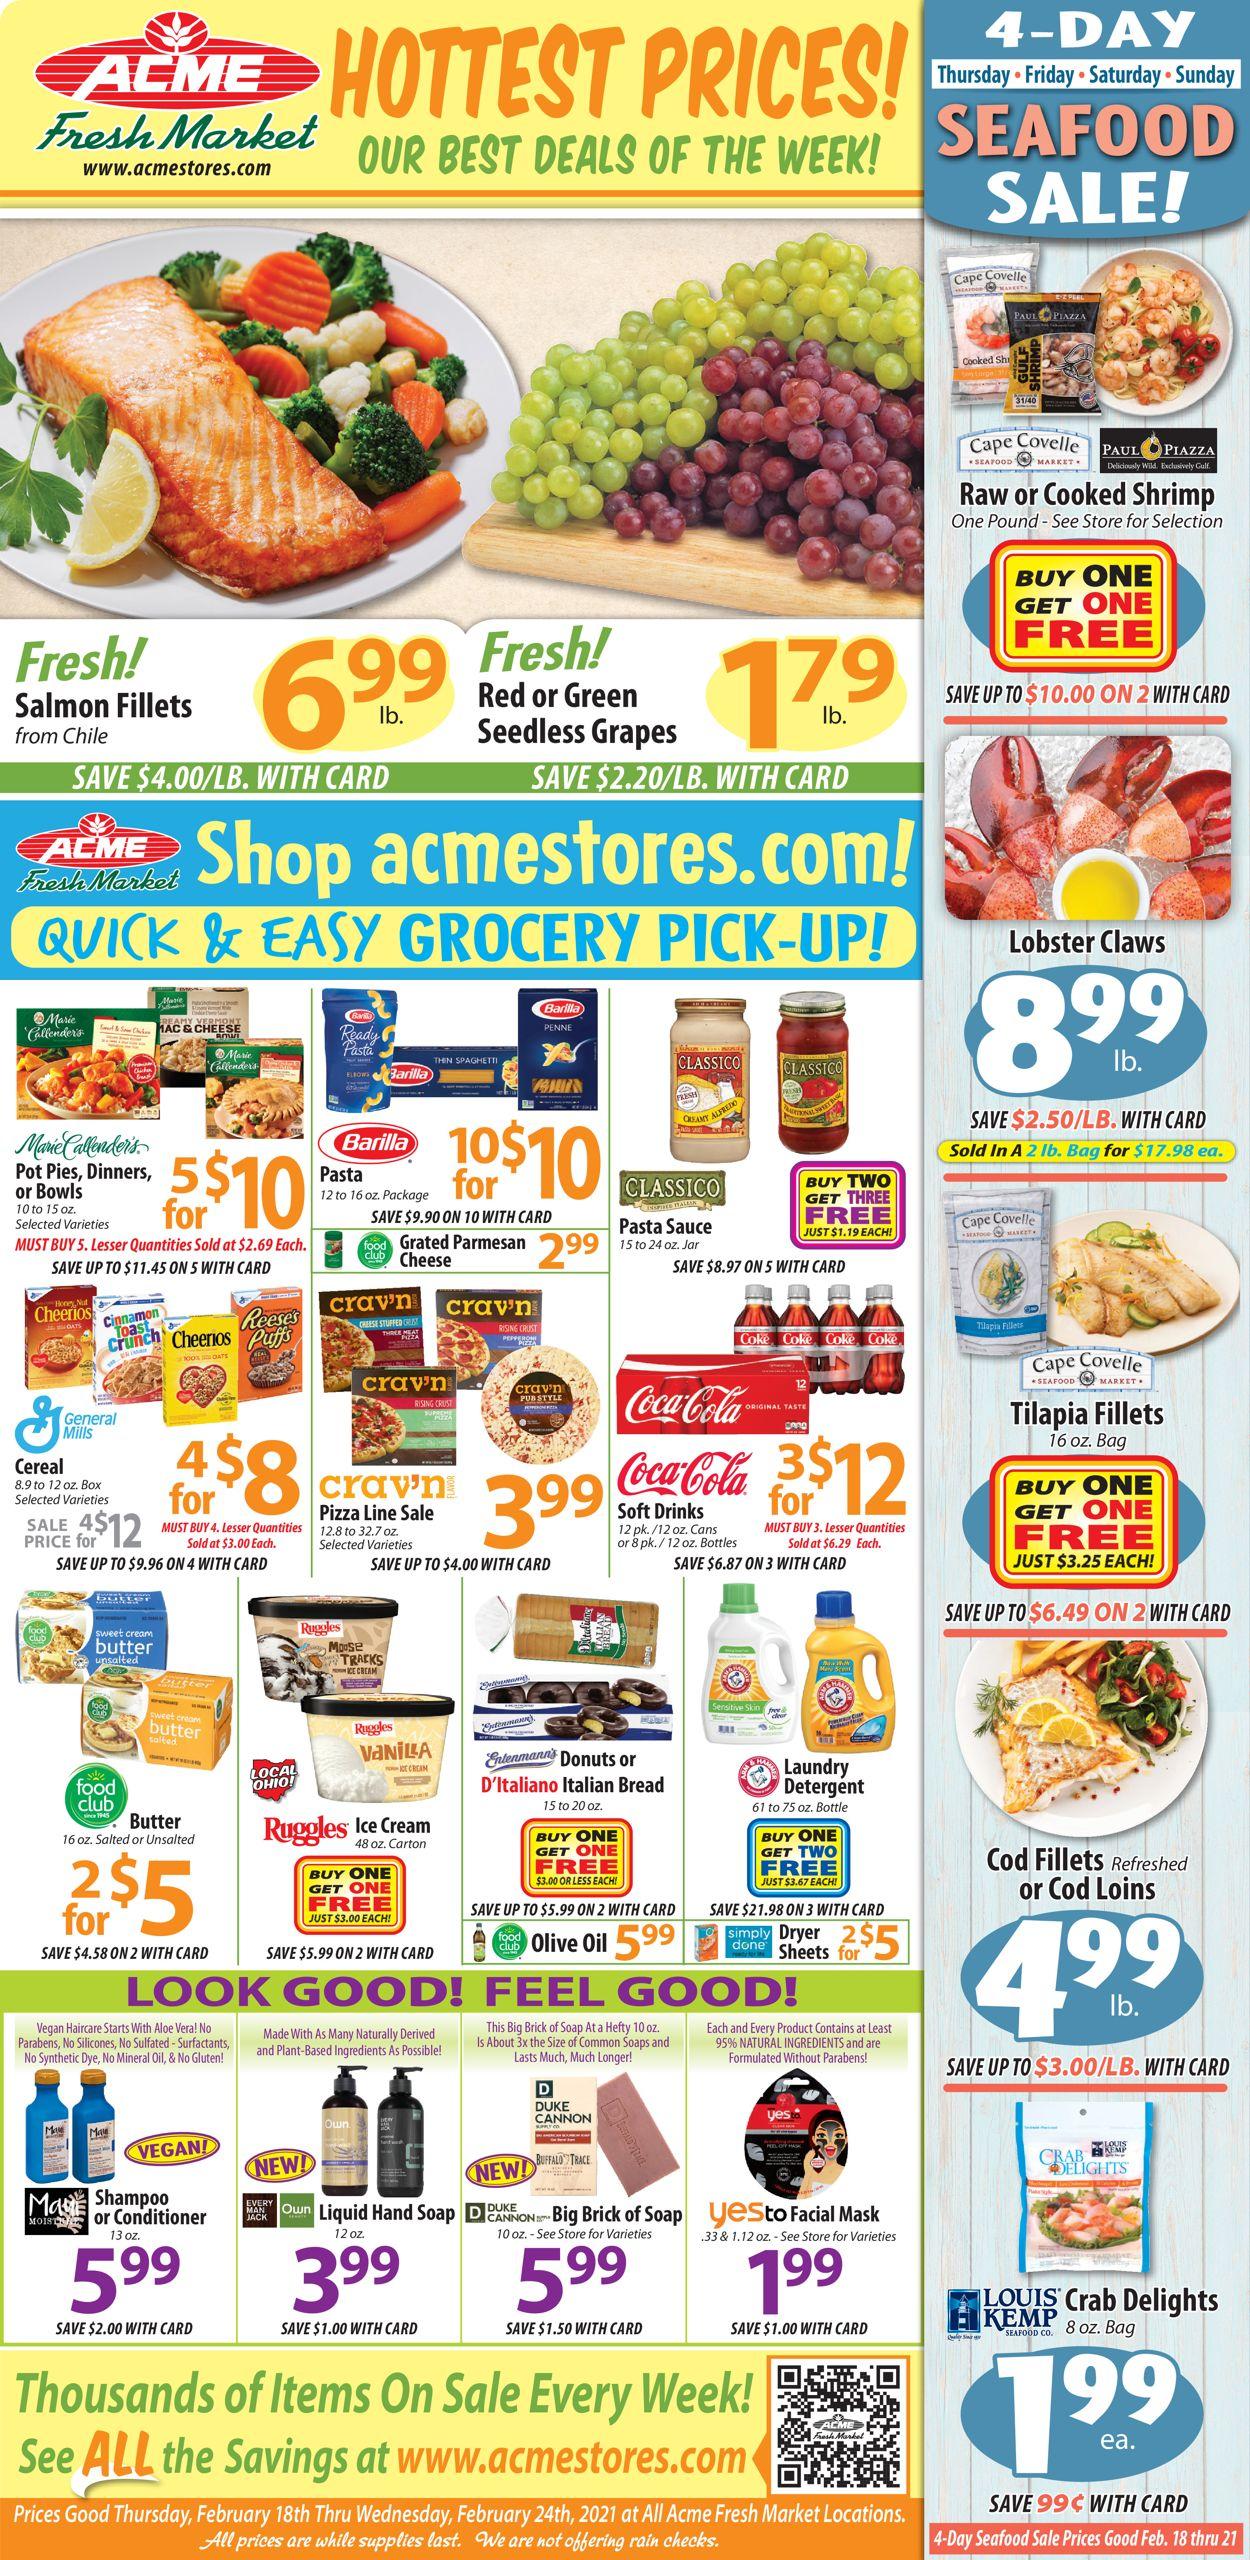 Acme Fresh Market Weekly Ad Circular - valid 02/18-02/24/2021